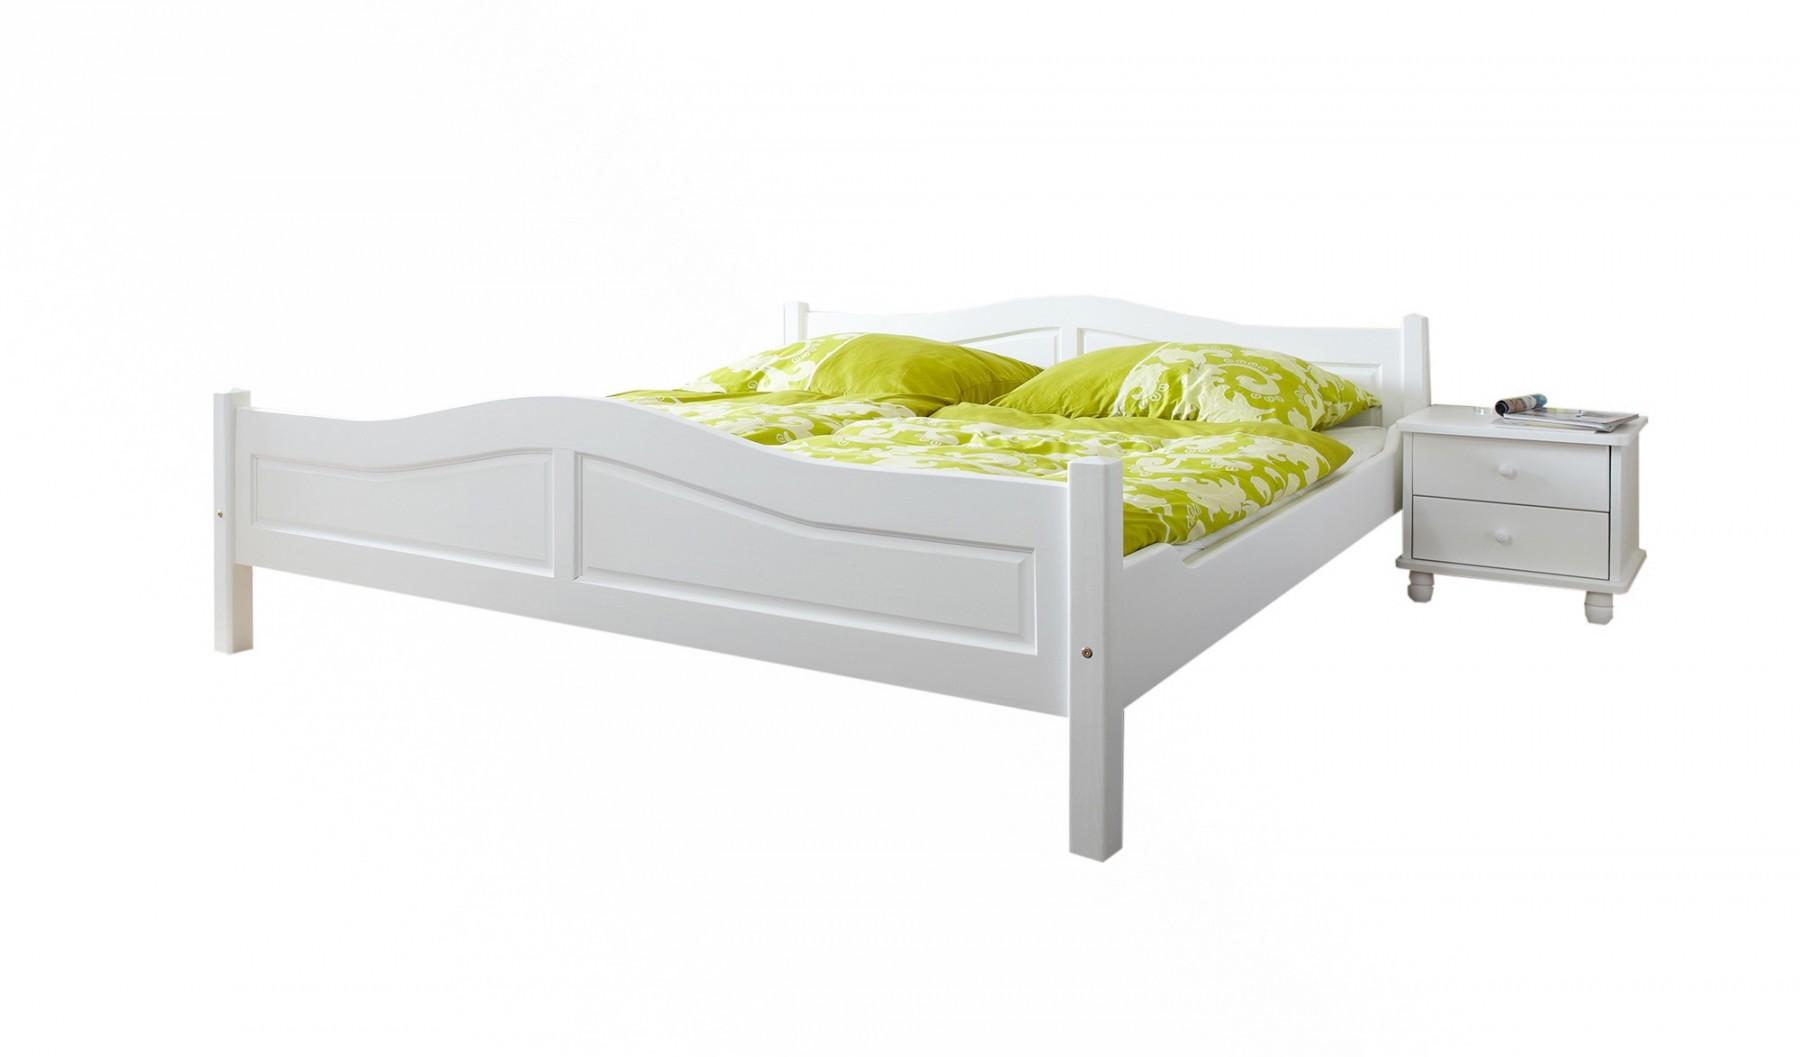 Full Size of Stabiles Bett Doppelbett Rita 140x200 Kiefer Doppelbetten Betten Kolonialstil 120 X 200 200x200 Komforthöhe Feng Shui Kopfteil Schlafzimmer Set Mit Bett Stabiles Bett